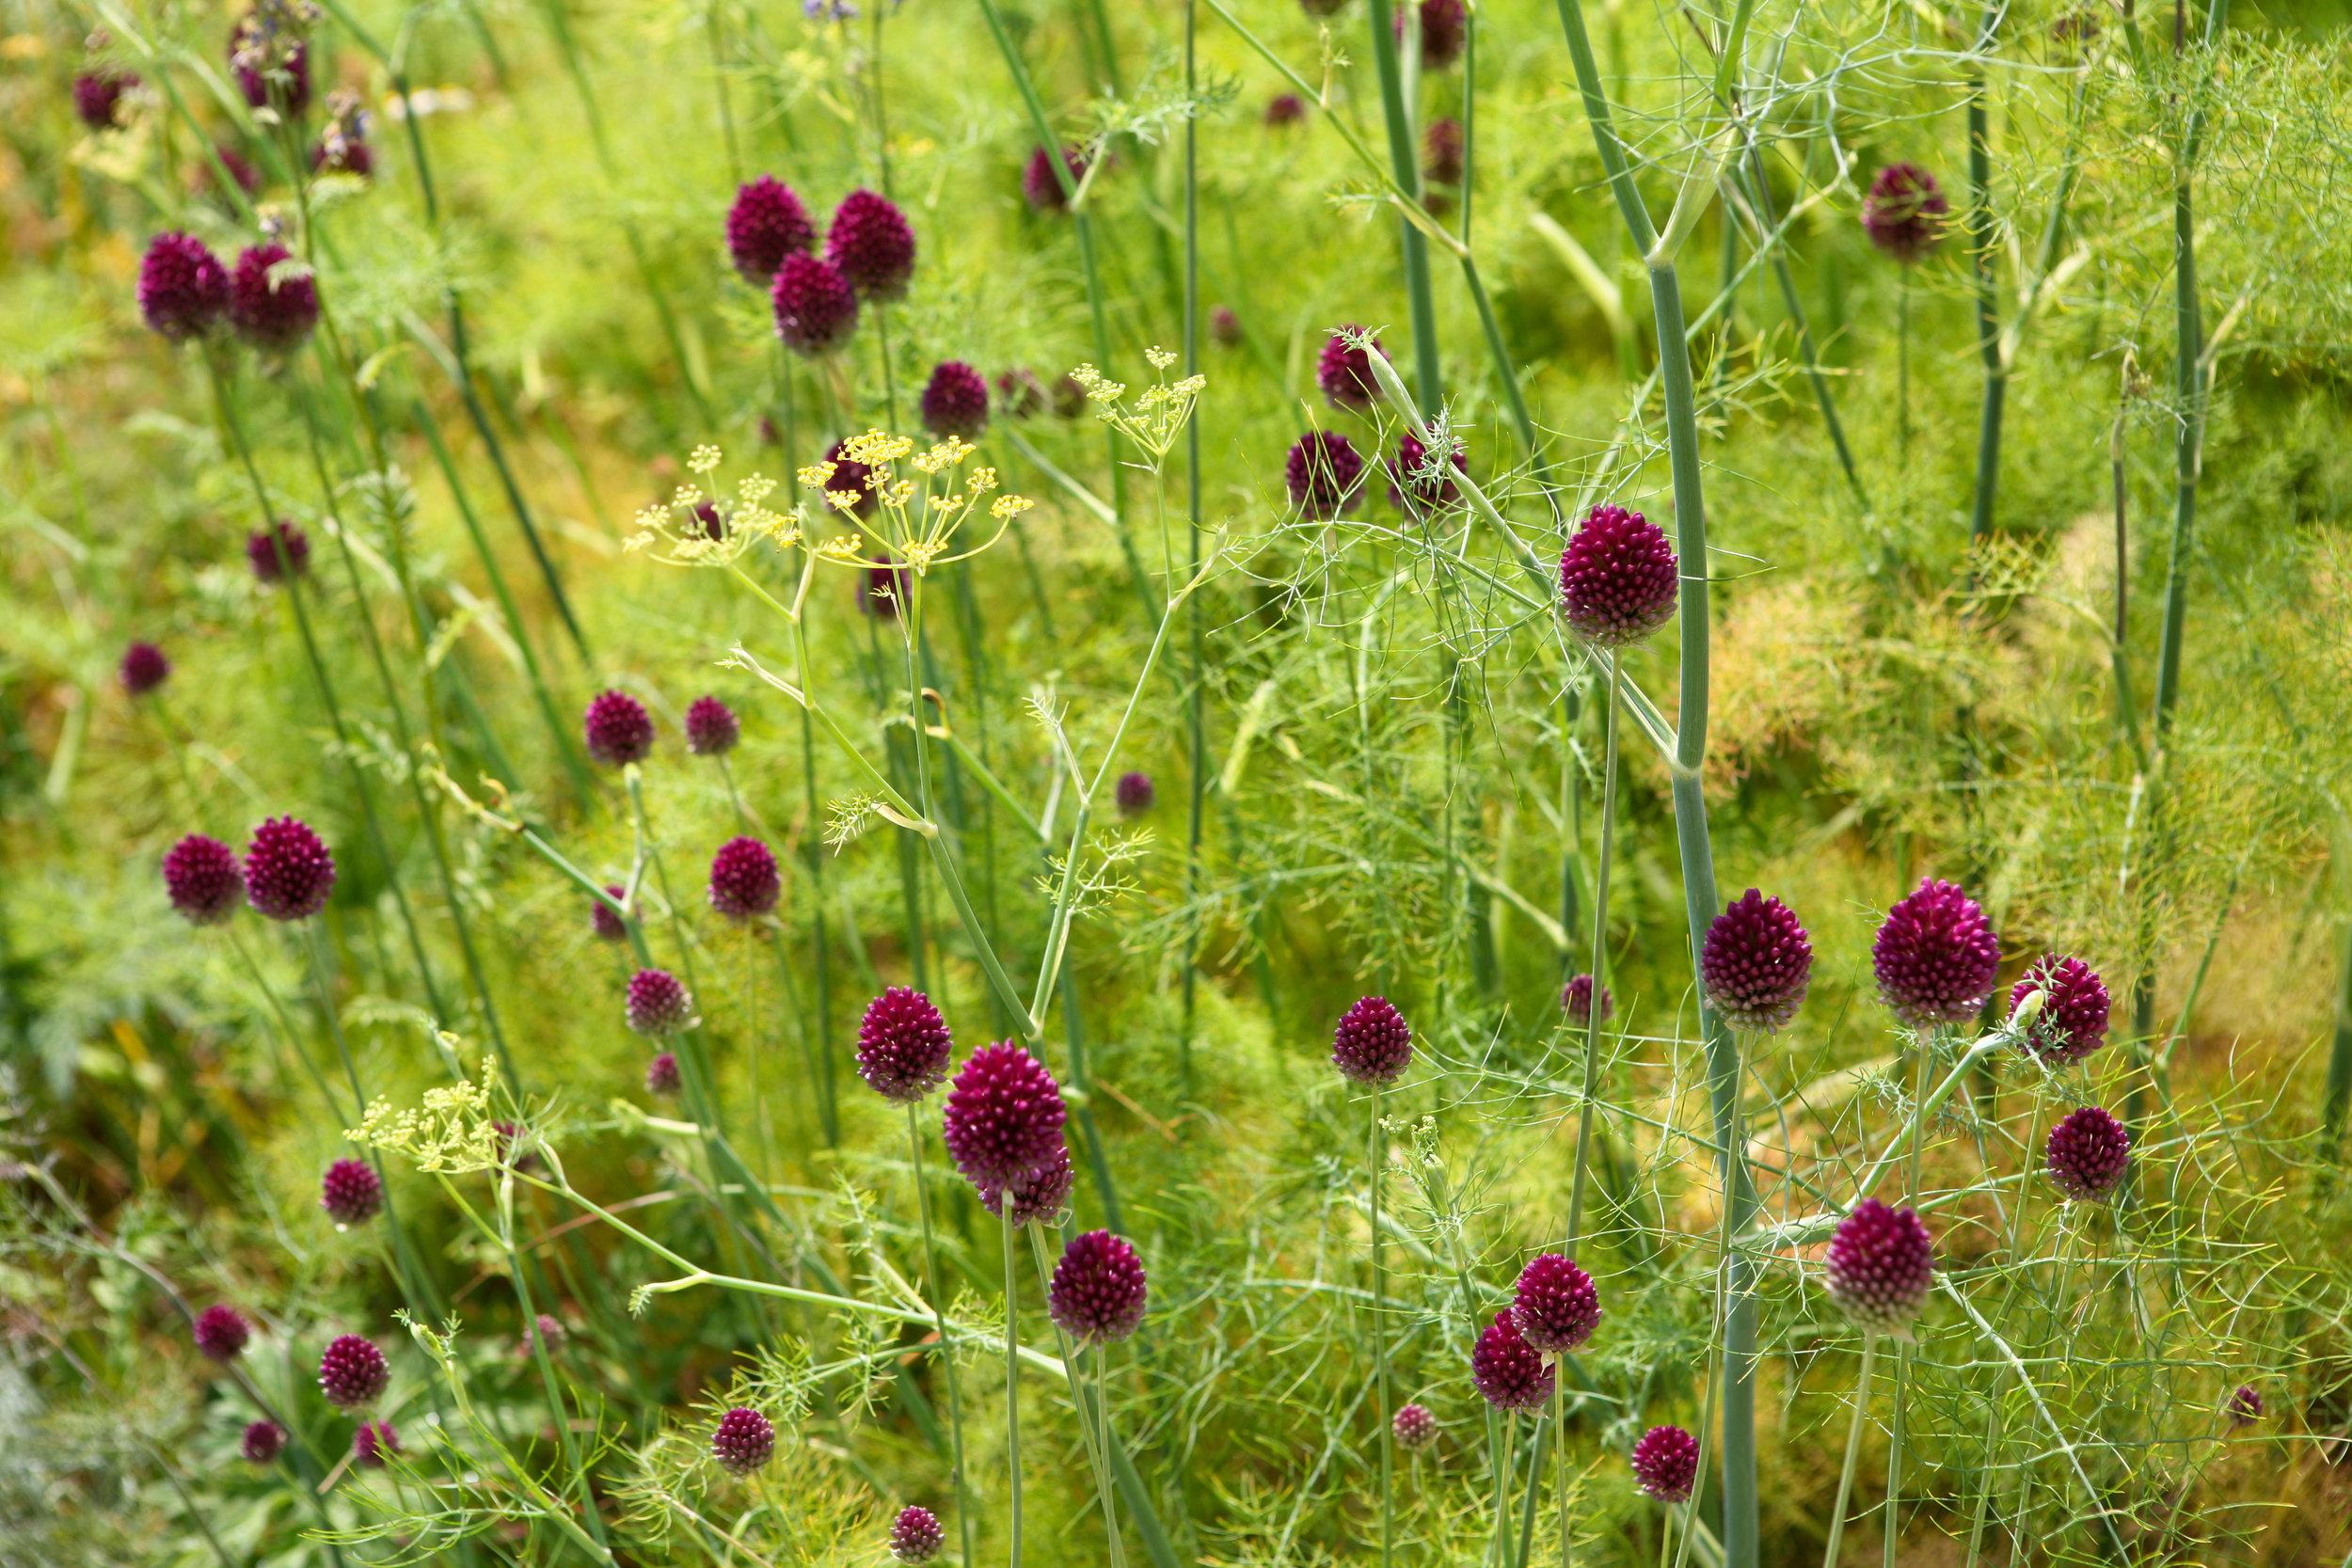 Contrasts: Bobbly  Allium sphaerocephalon  with fluffy fennel foliage